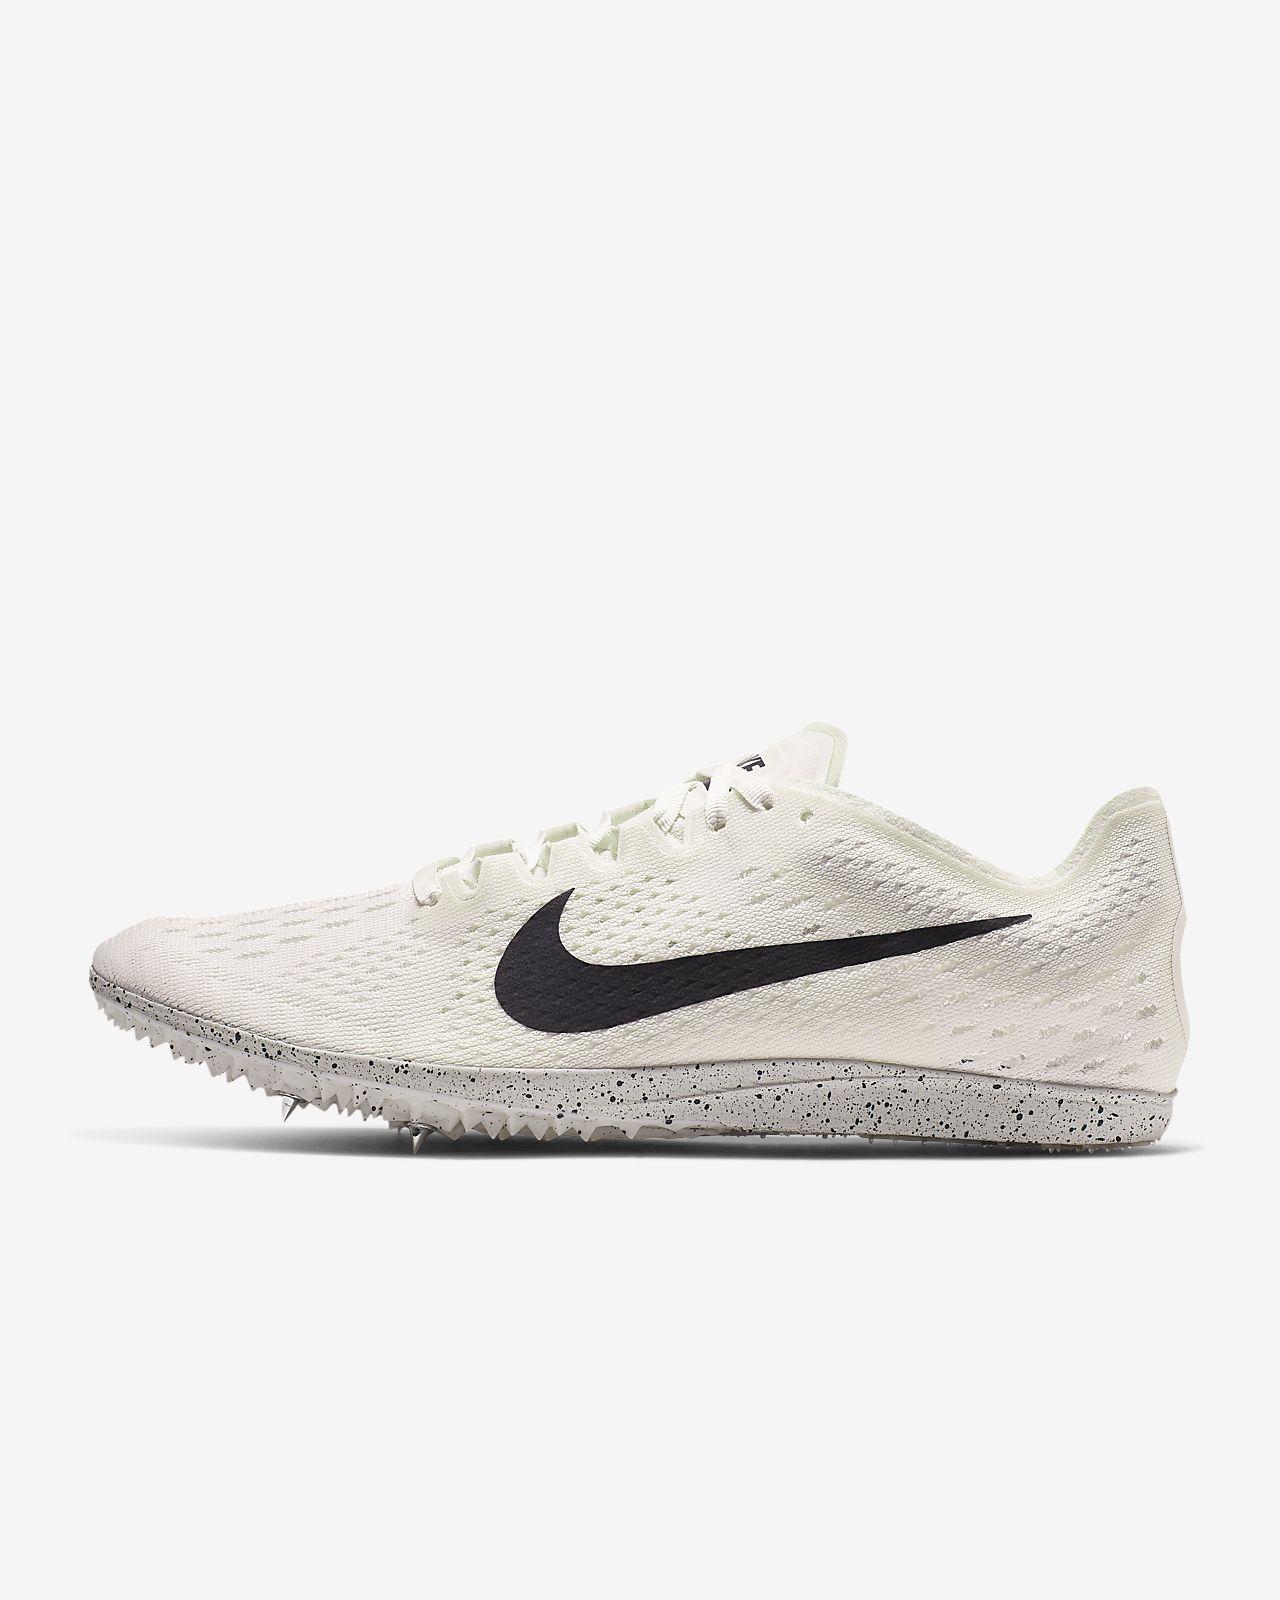 Kolce biegowe uniseks Nike Zoom Matumbo 3